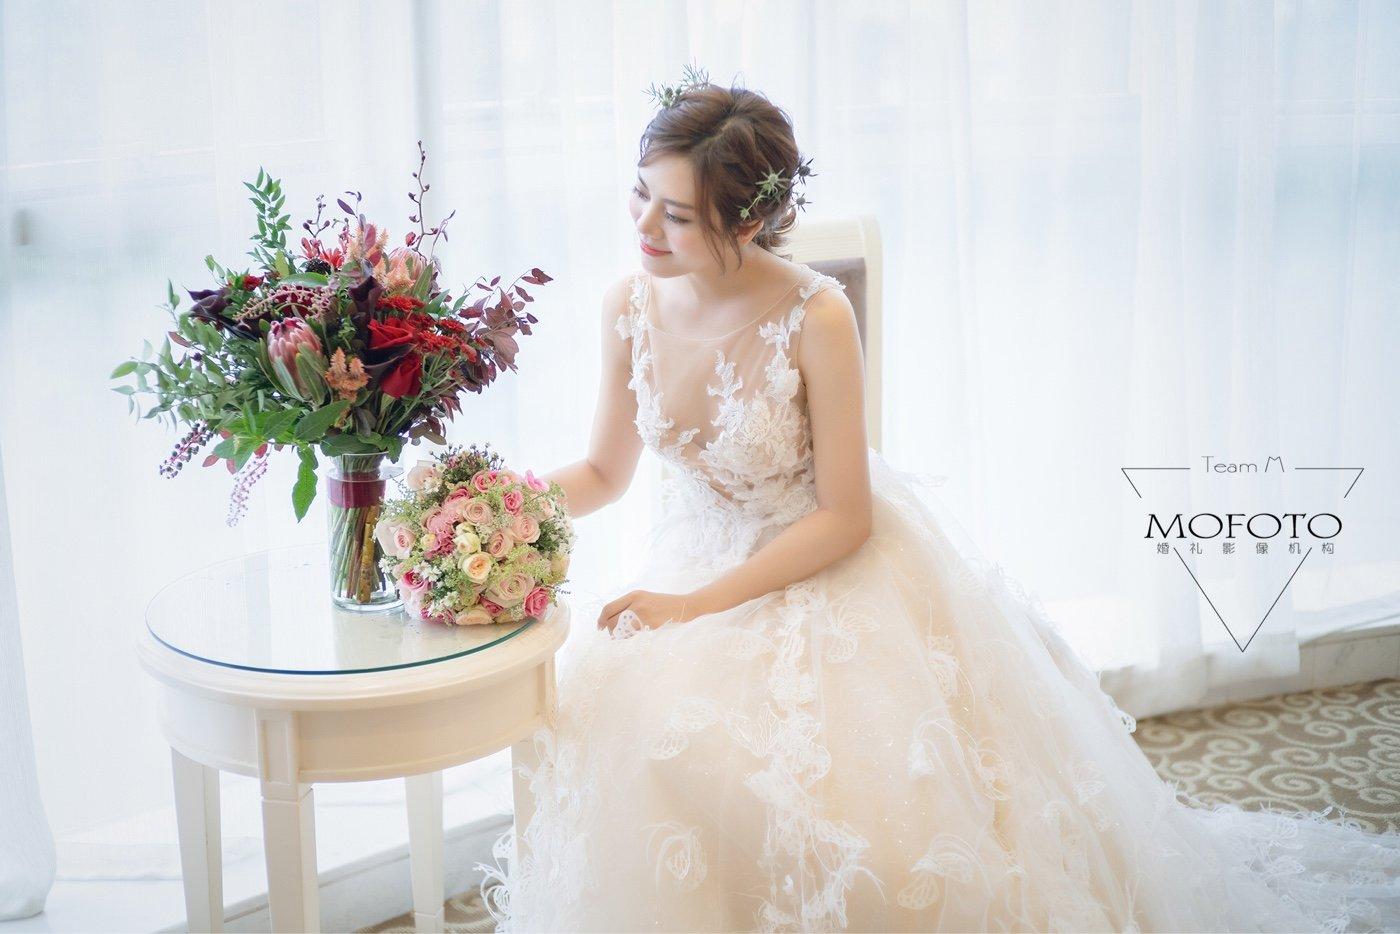 MoFoTo 婚礼拍摄8